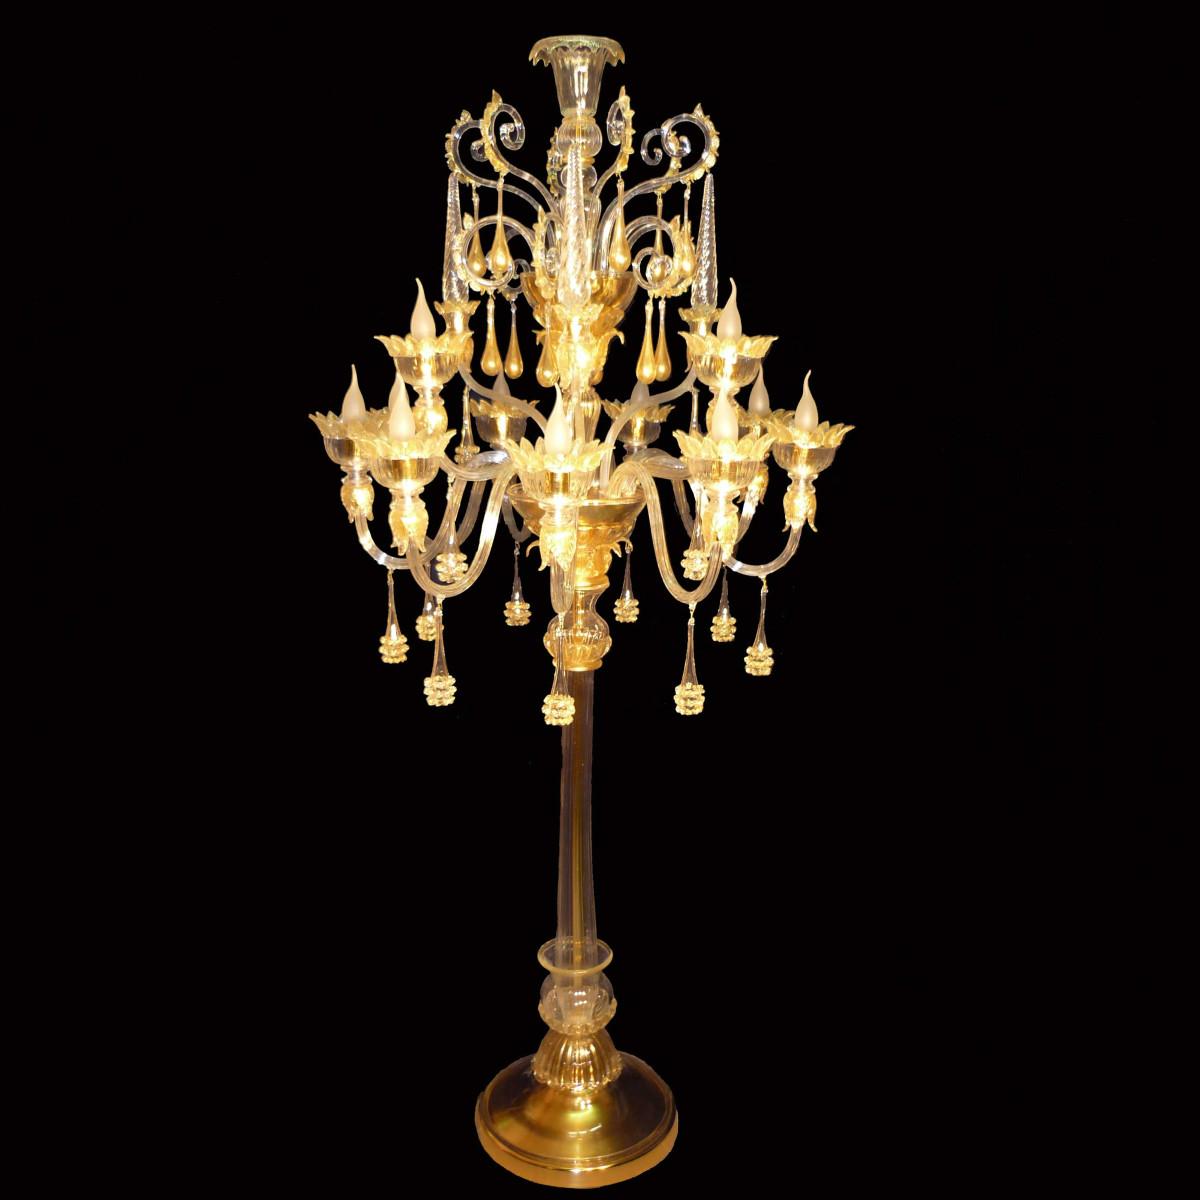 """Fiamma"" 12 luces lámpara de piso de Murano"